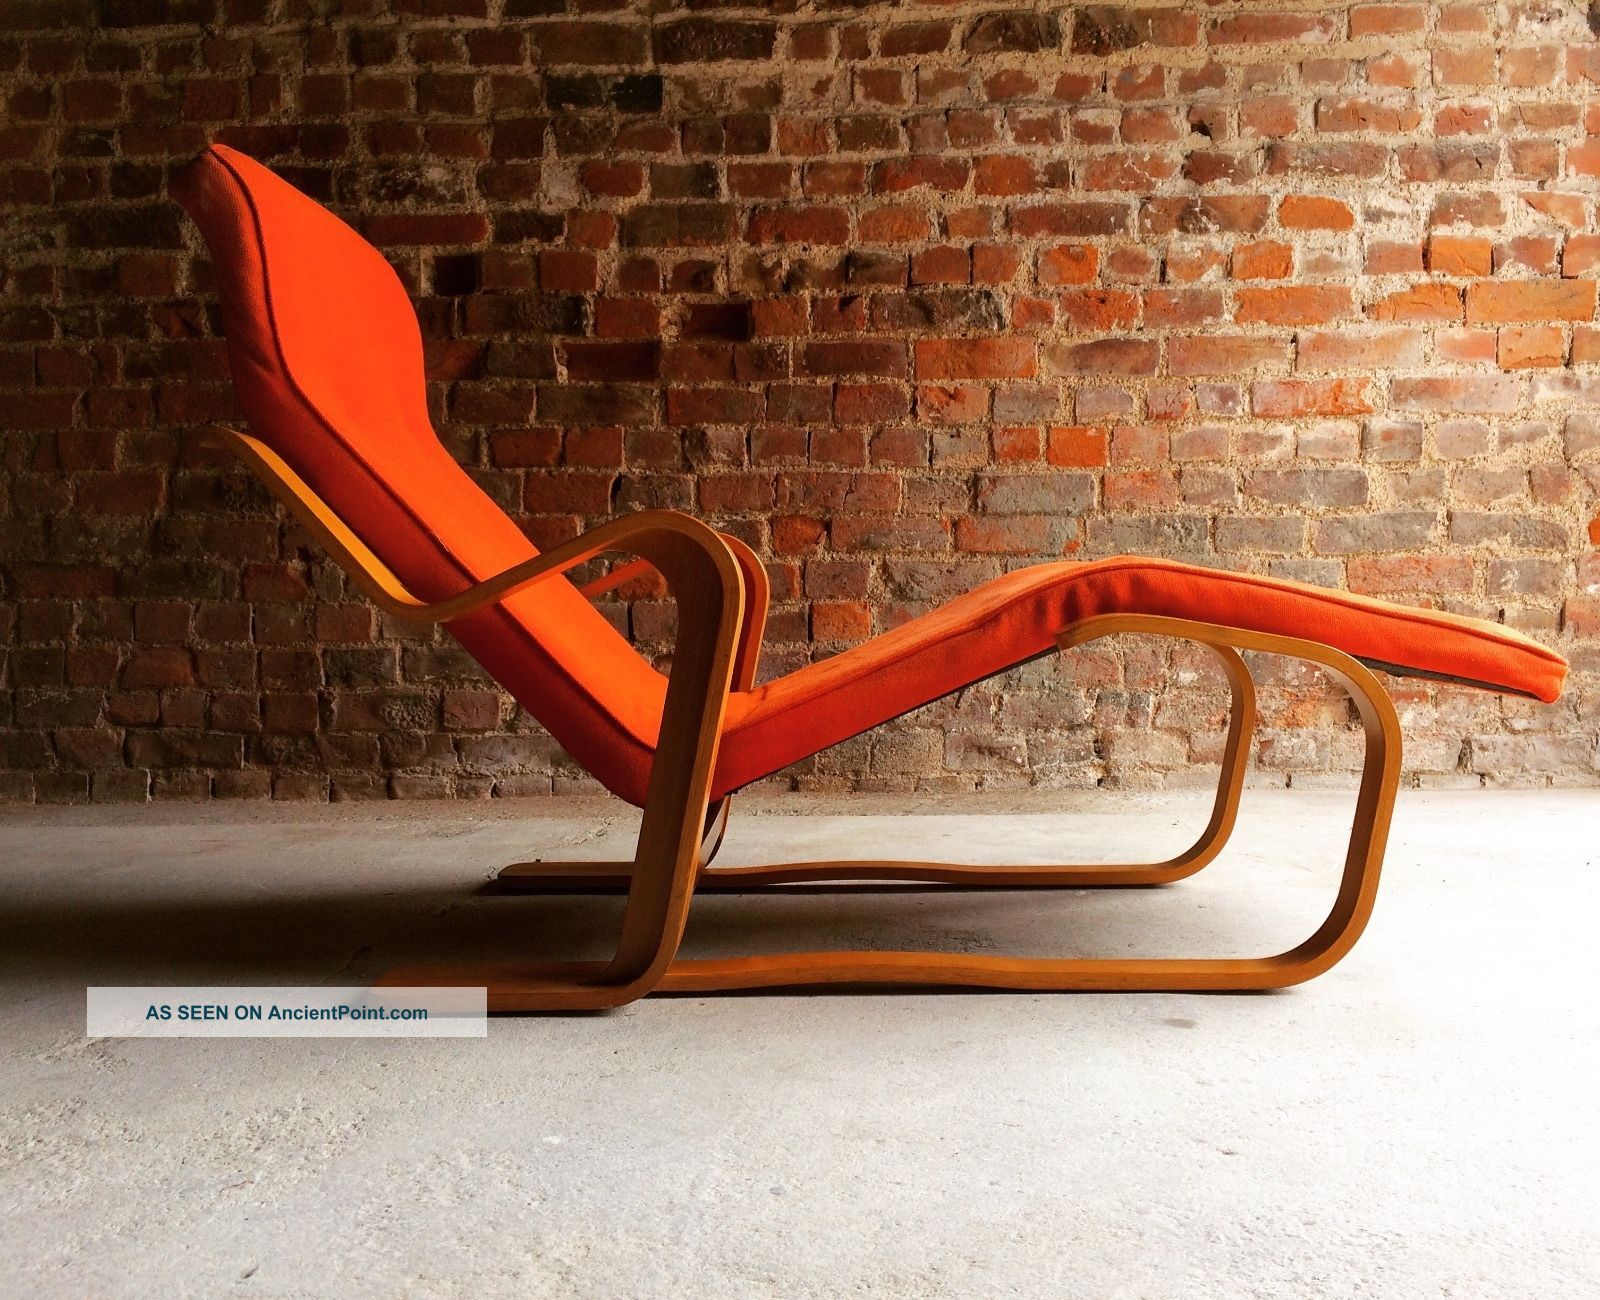 Stunning Marcel Breuer Long Chair Chaise Longue Mid Century 1970 ' S Bauhaus 1900-1950 photo